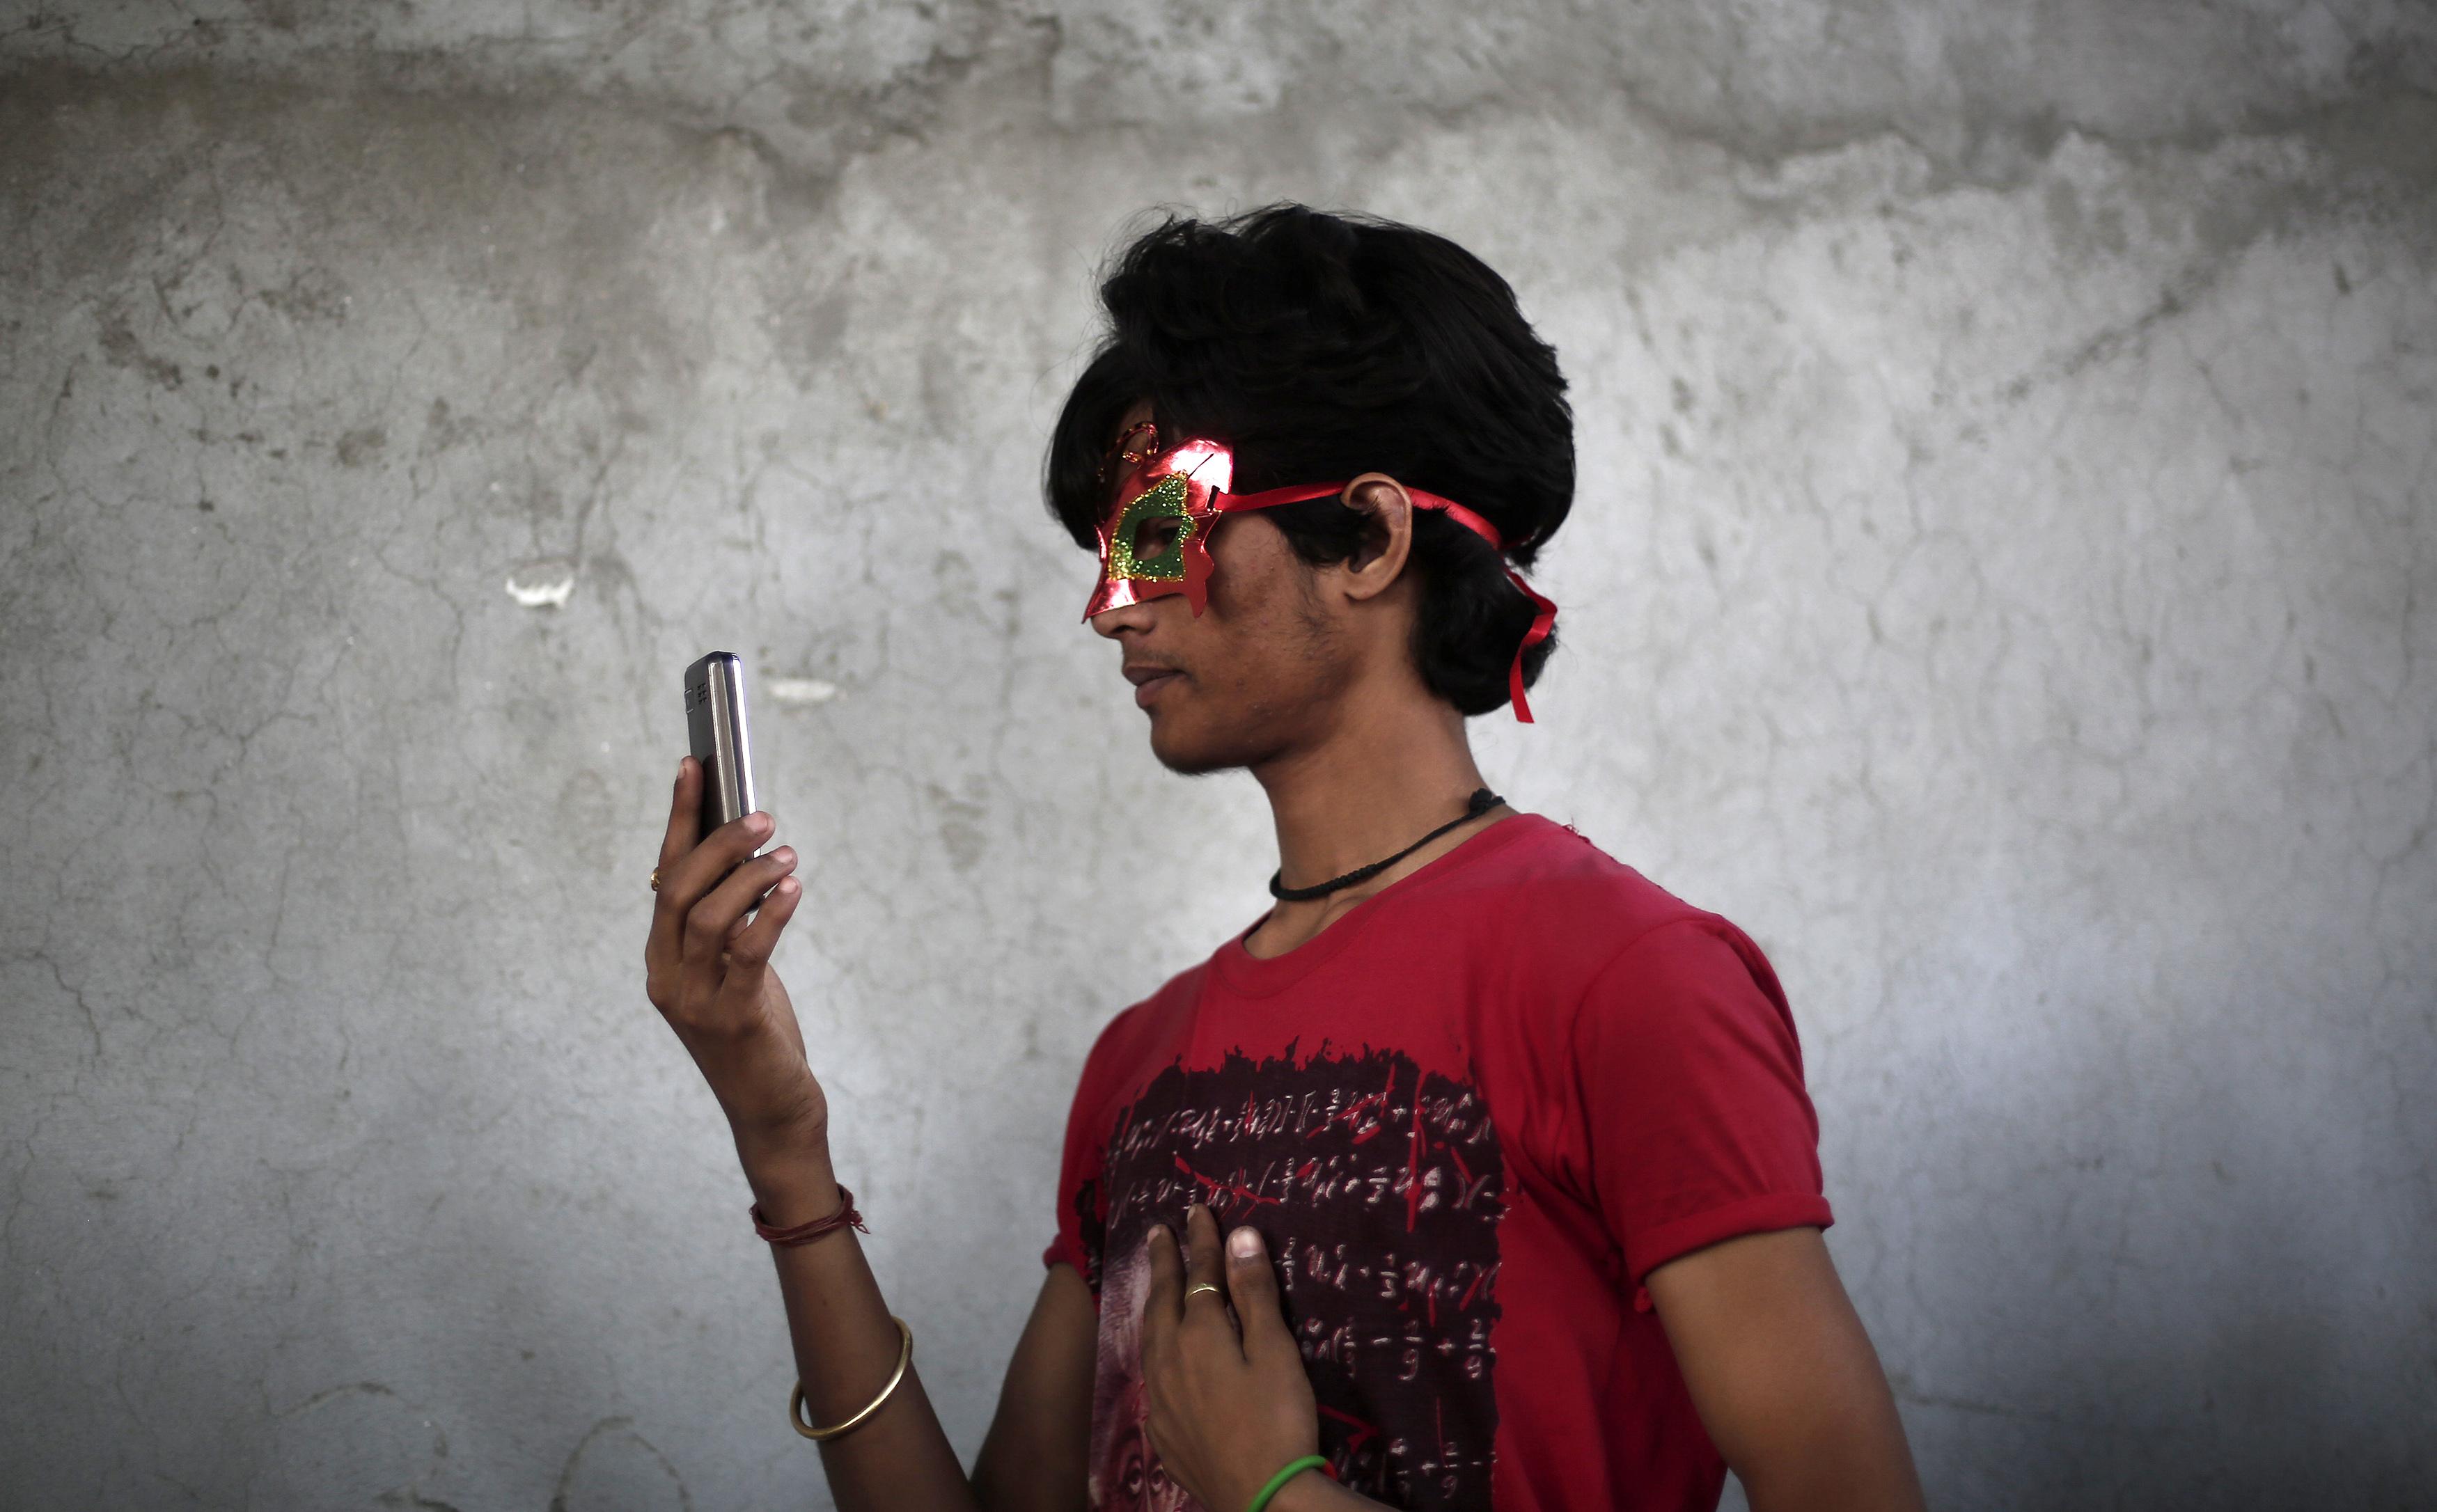 A participant takes a selfie during Delhi Queer Pride Parade in New Delhi